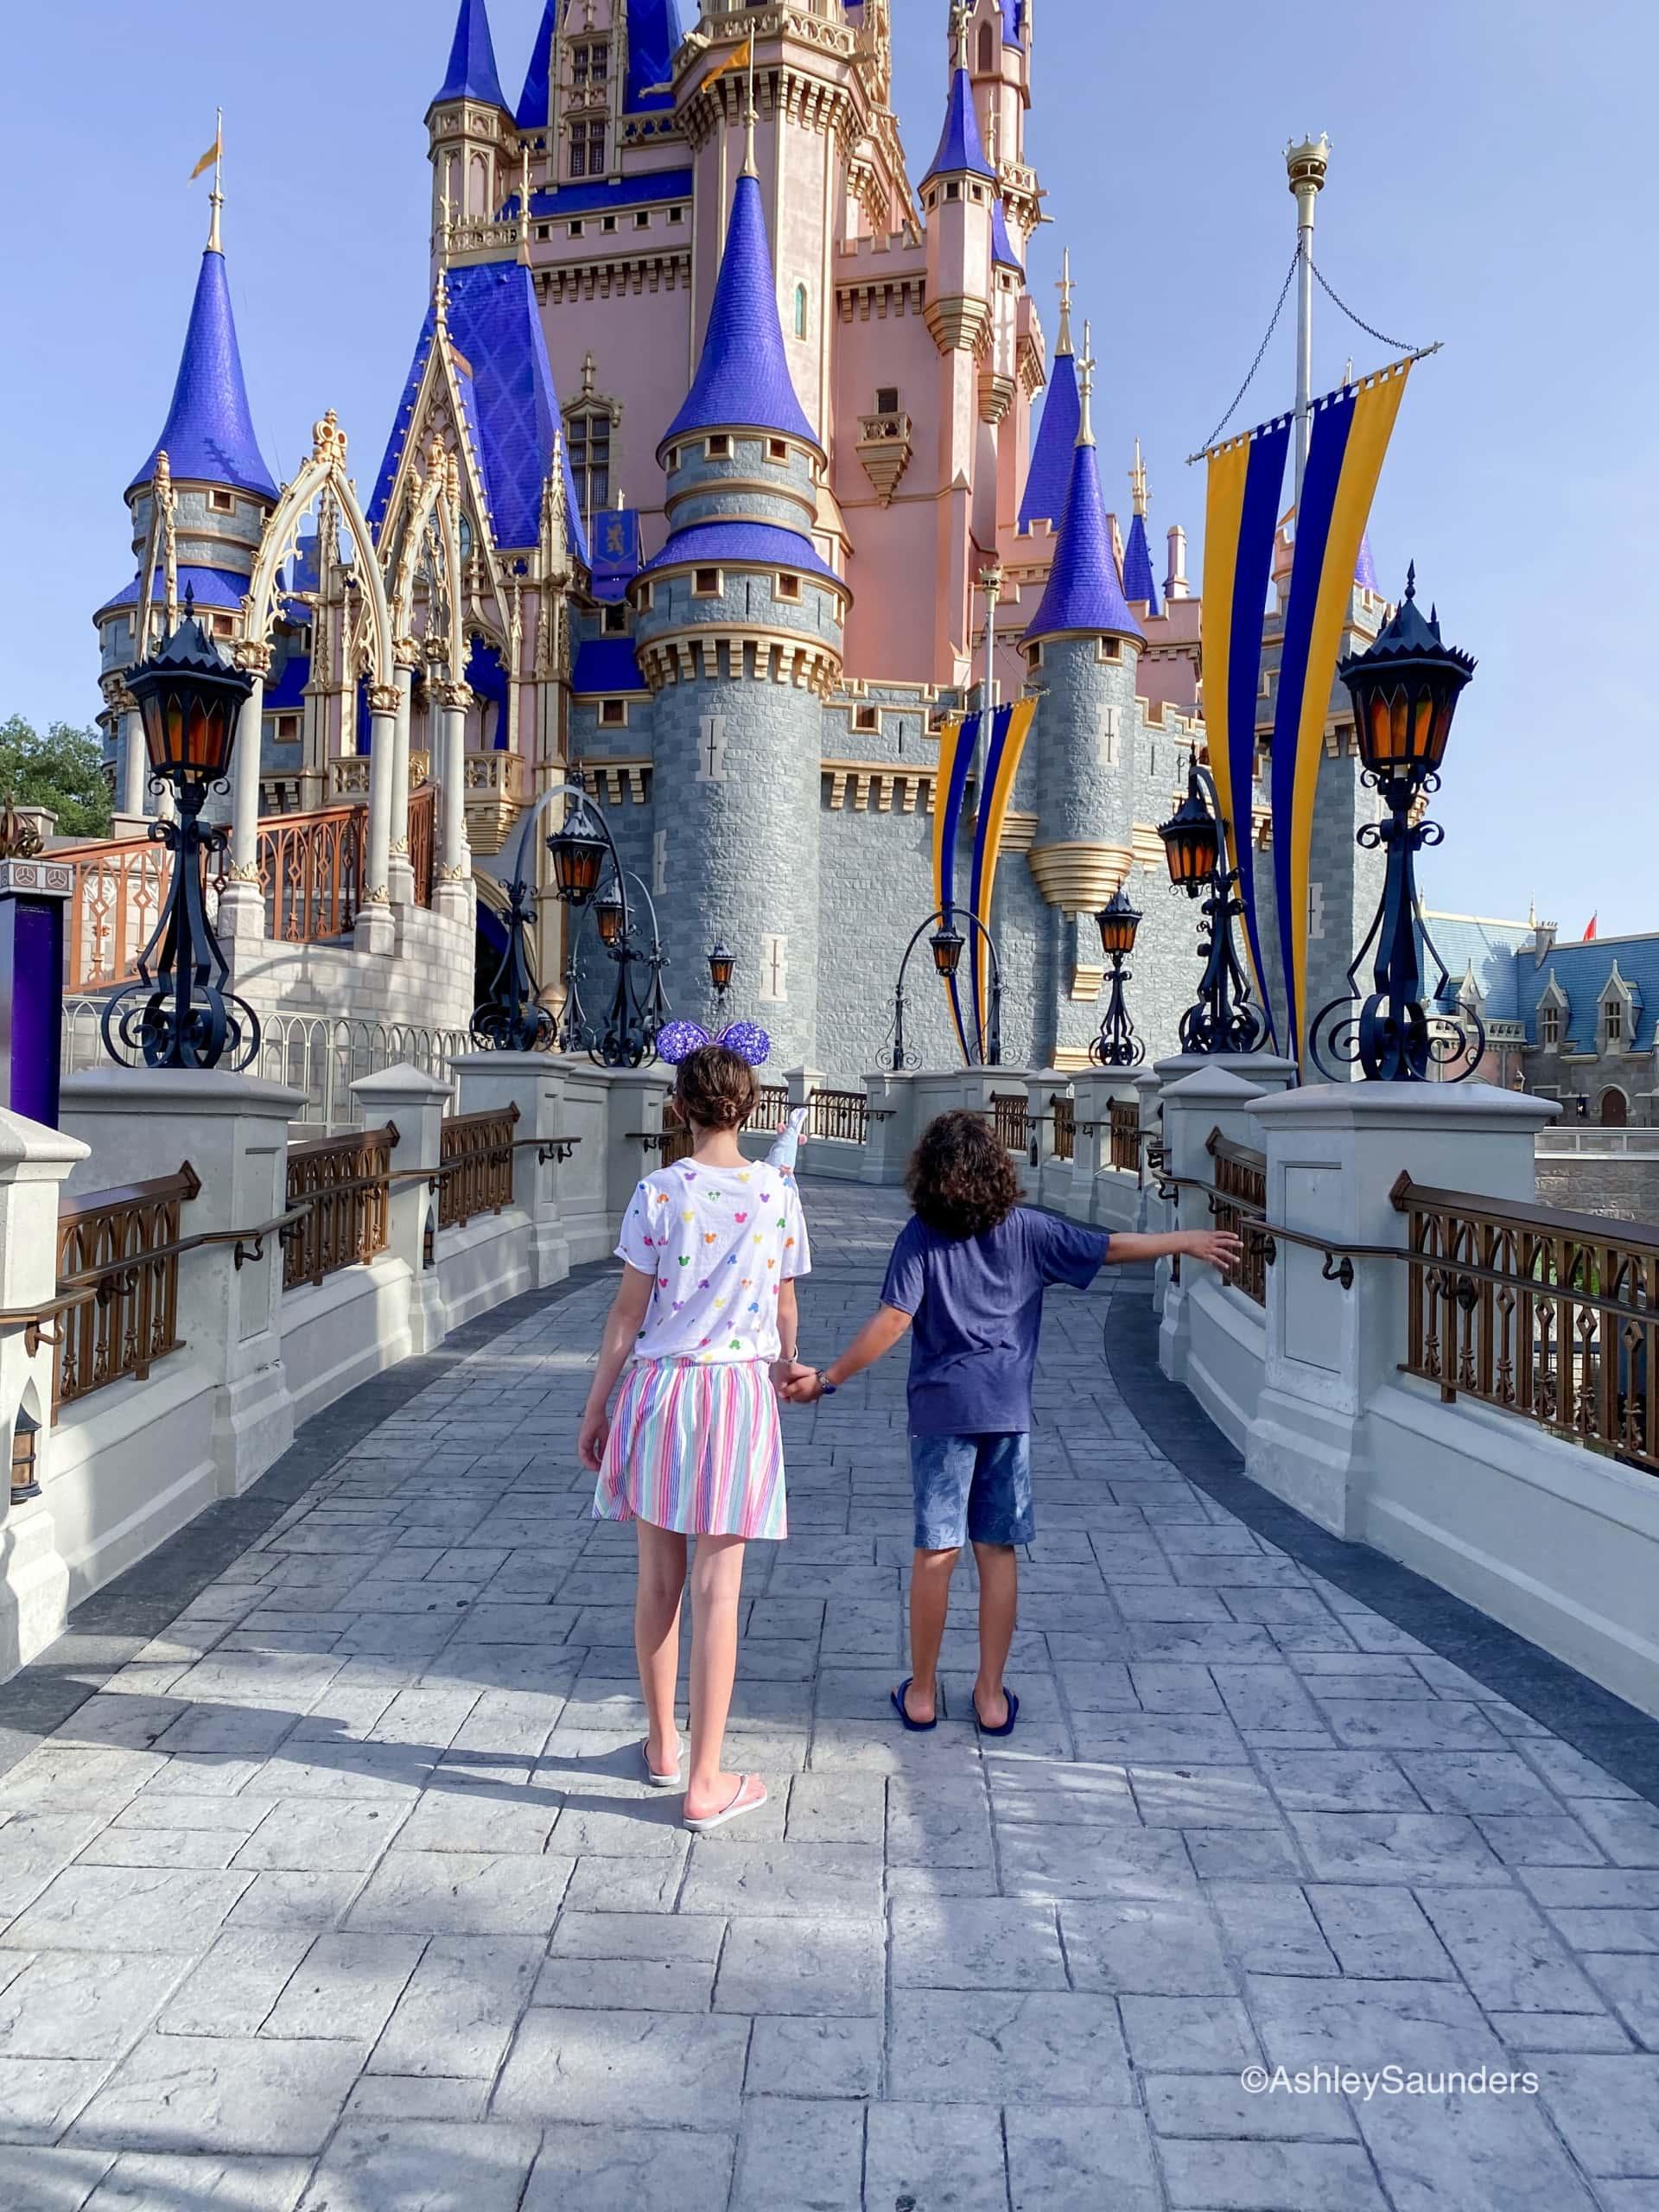 Visiting Disney World in 2020